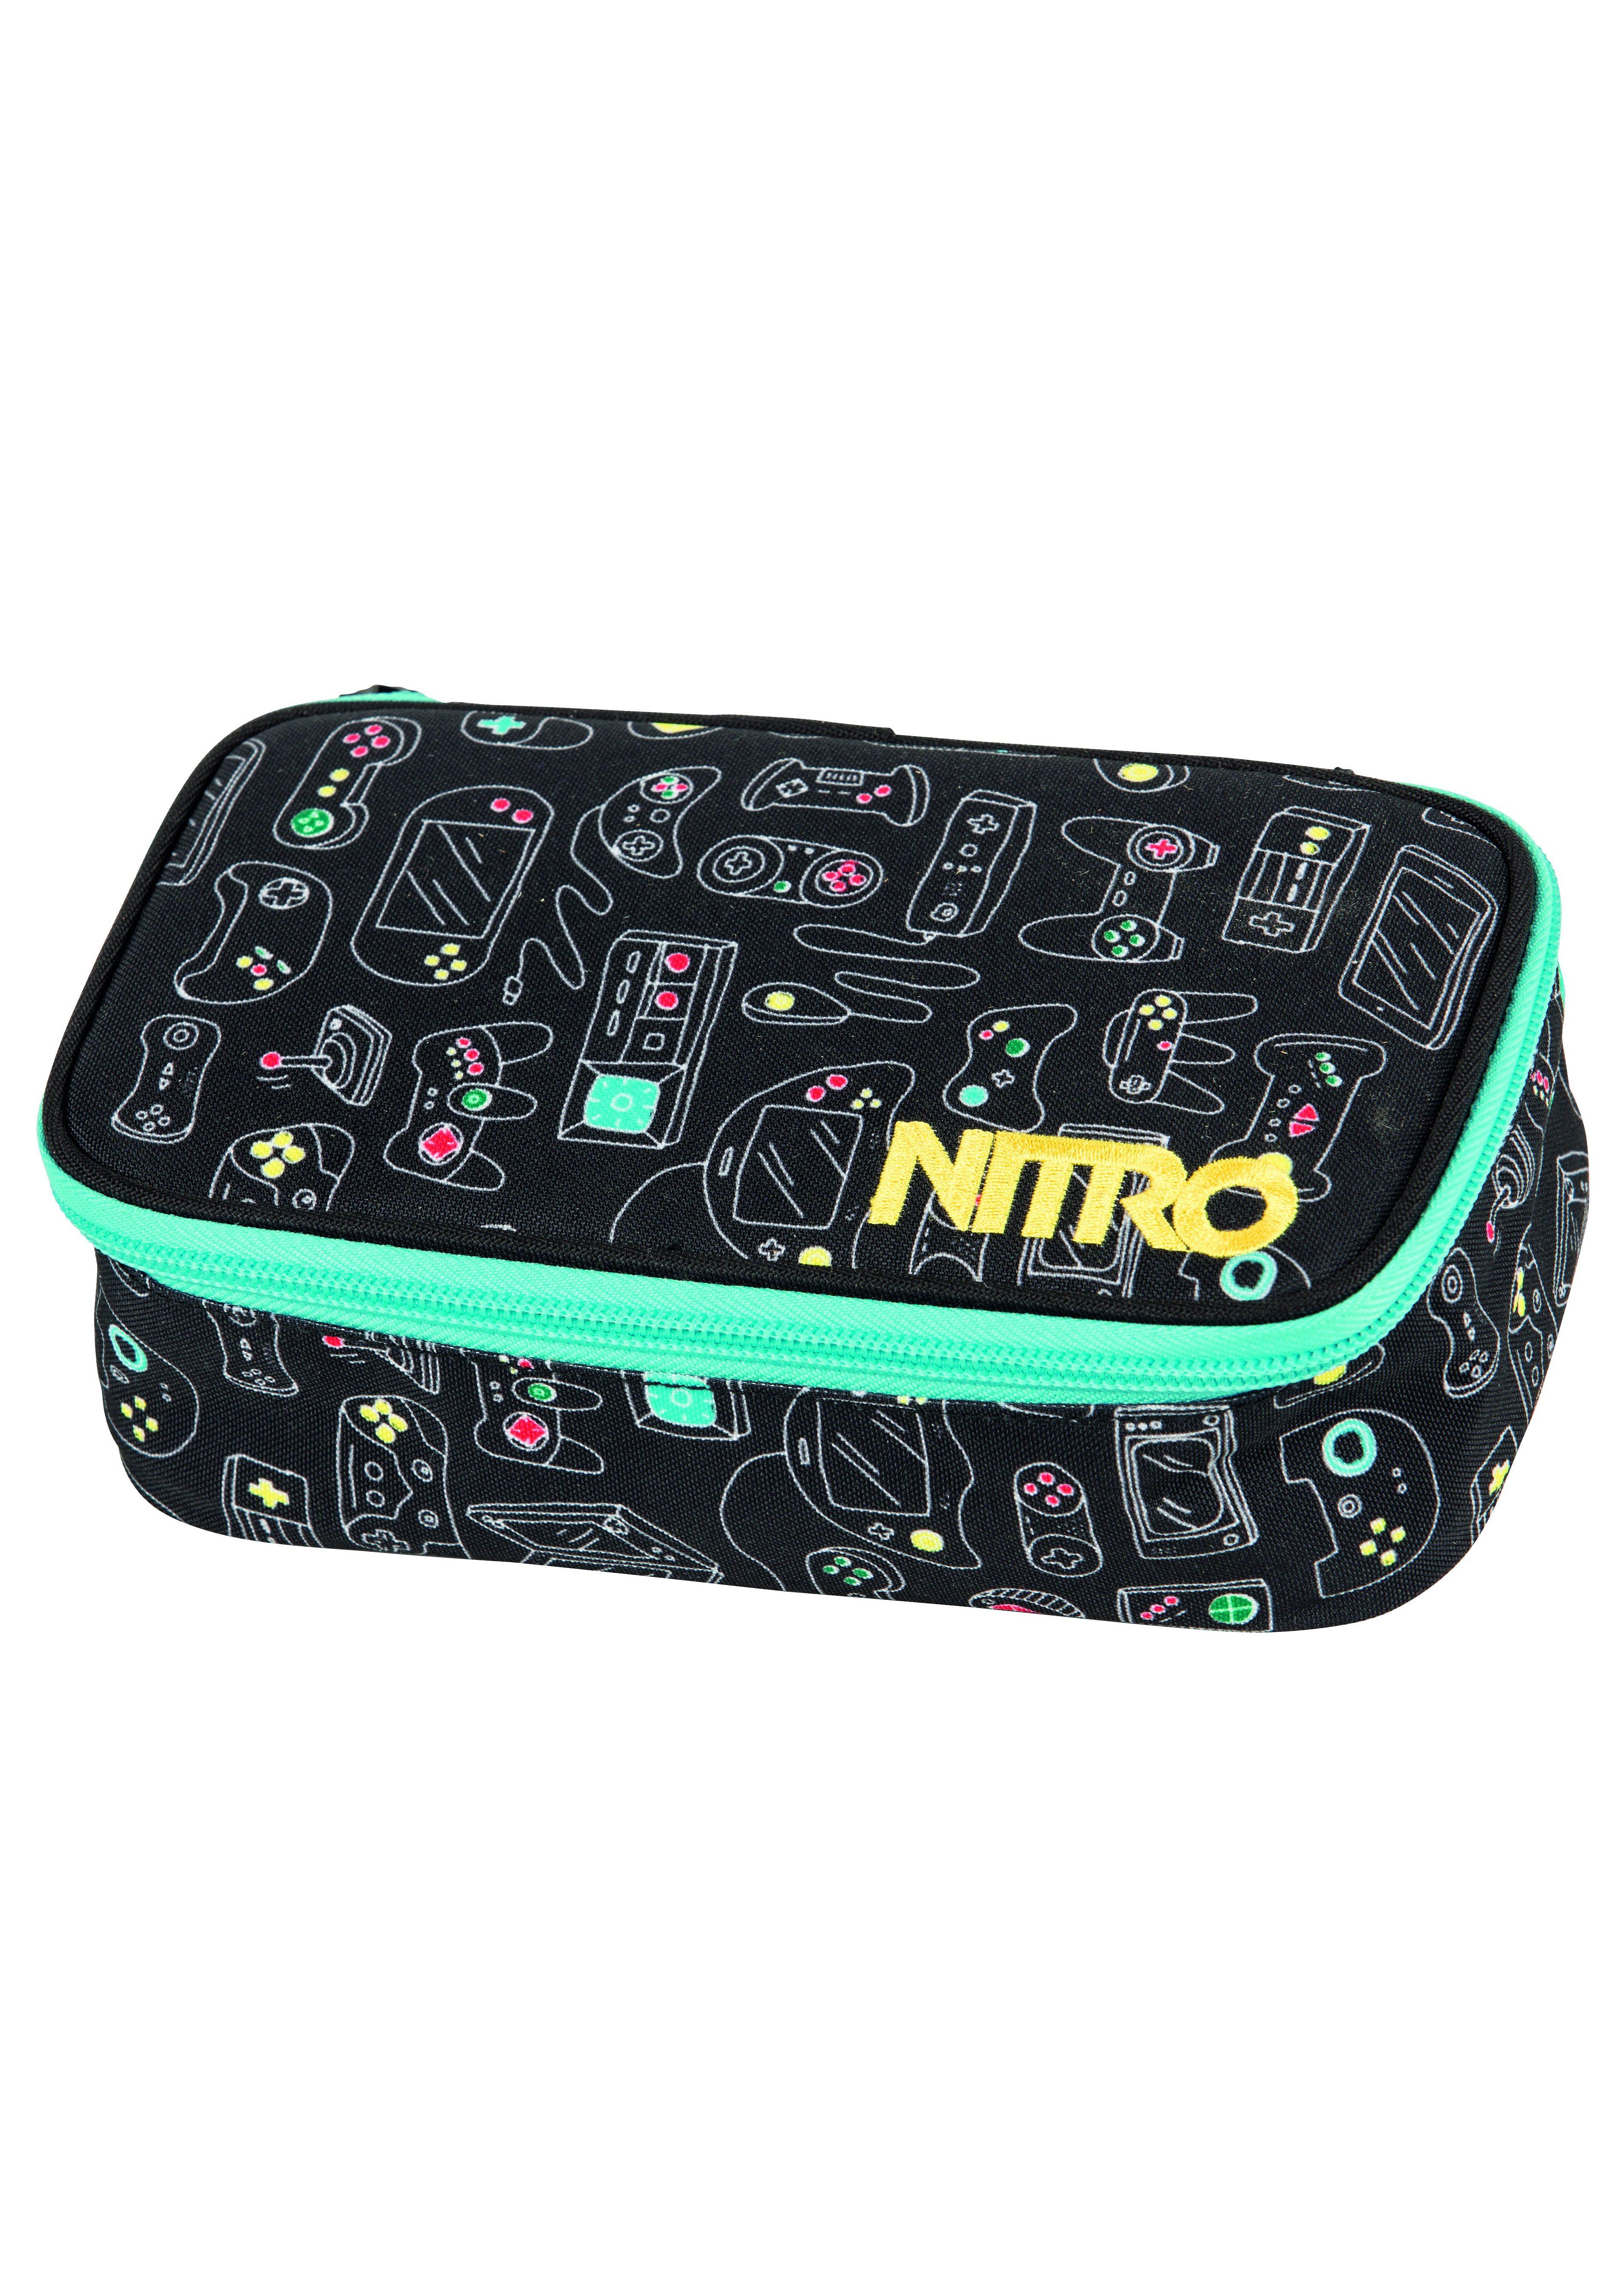 Nitro Mäppchen, »Pencil Case XL - Gaming«